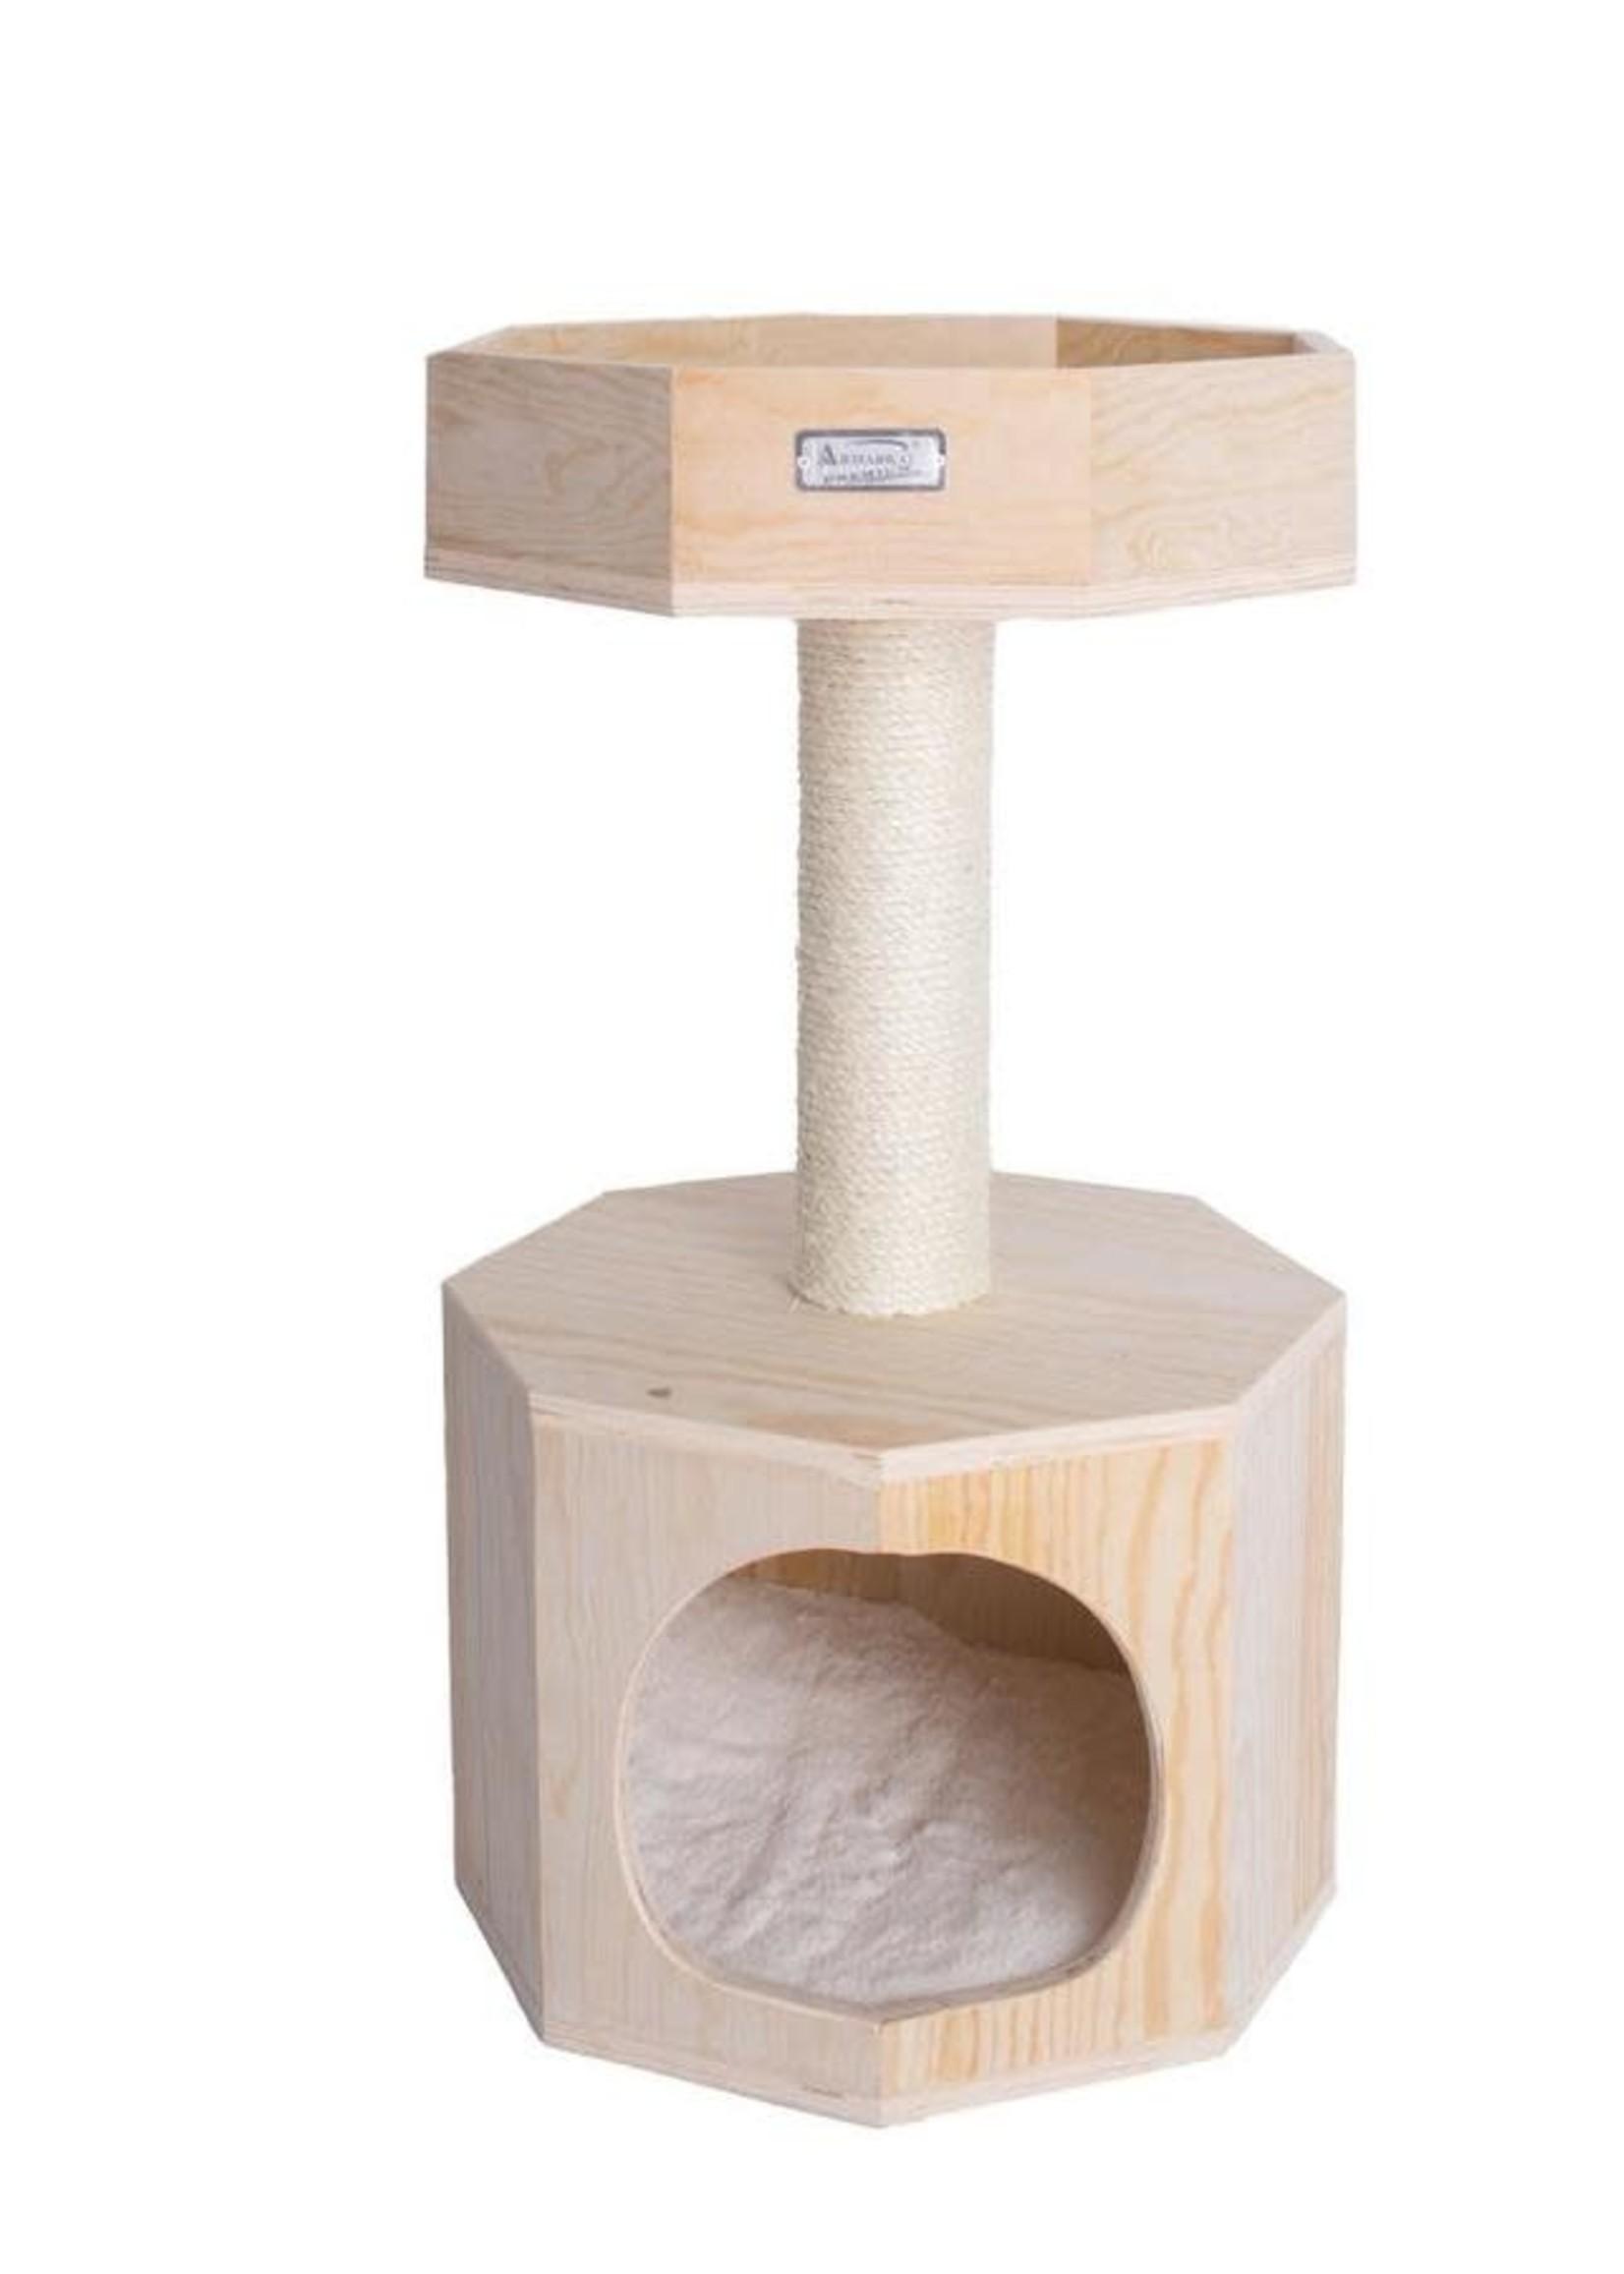 "Armarkat Armarkat 29"" Premium Scots Pine Cat Tree w/Perch & Condo"